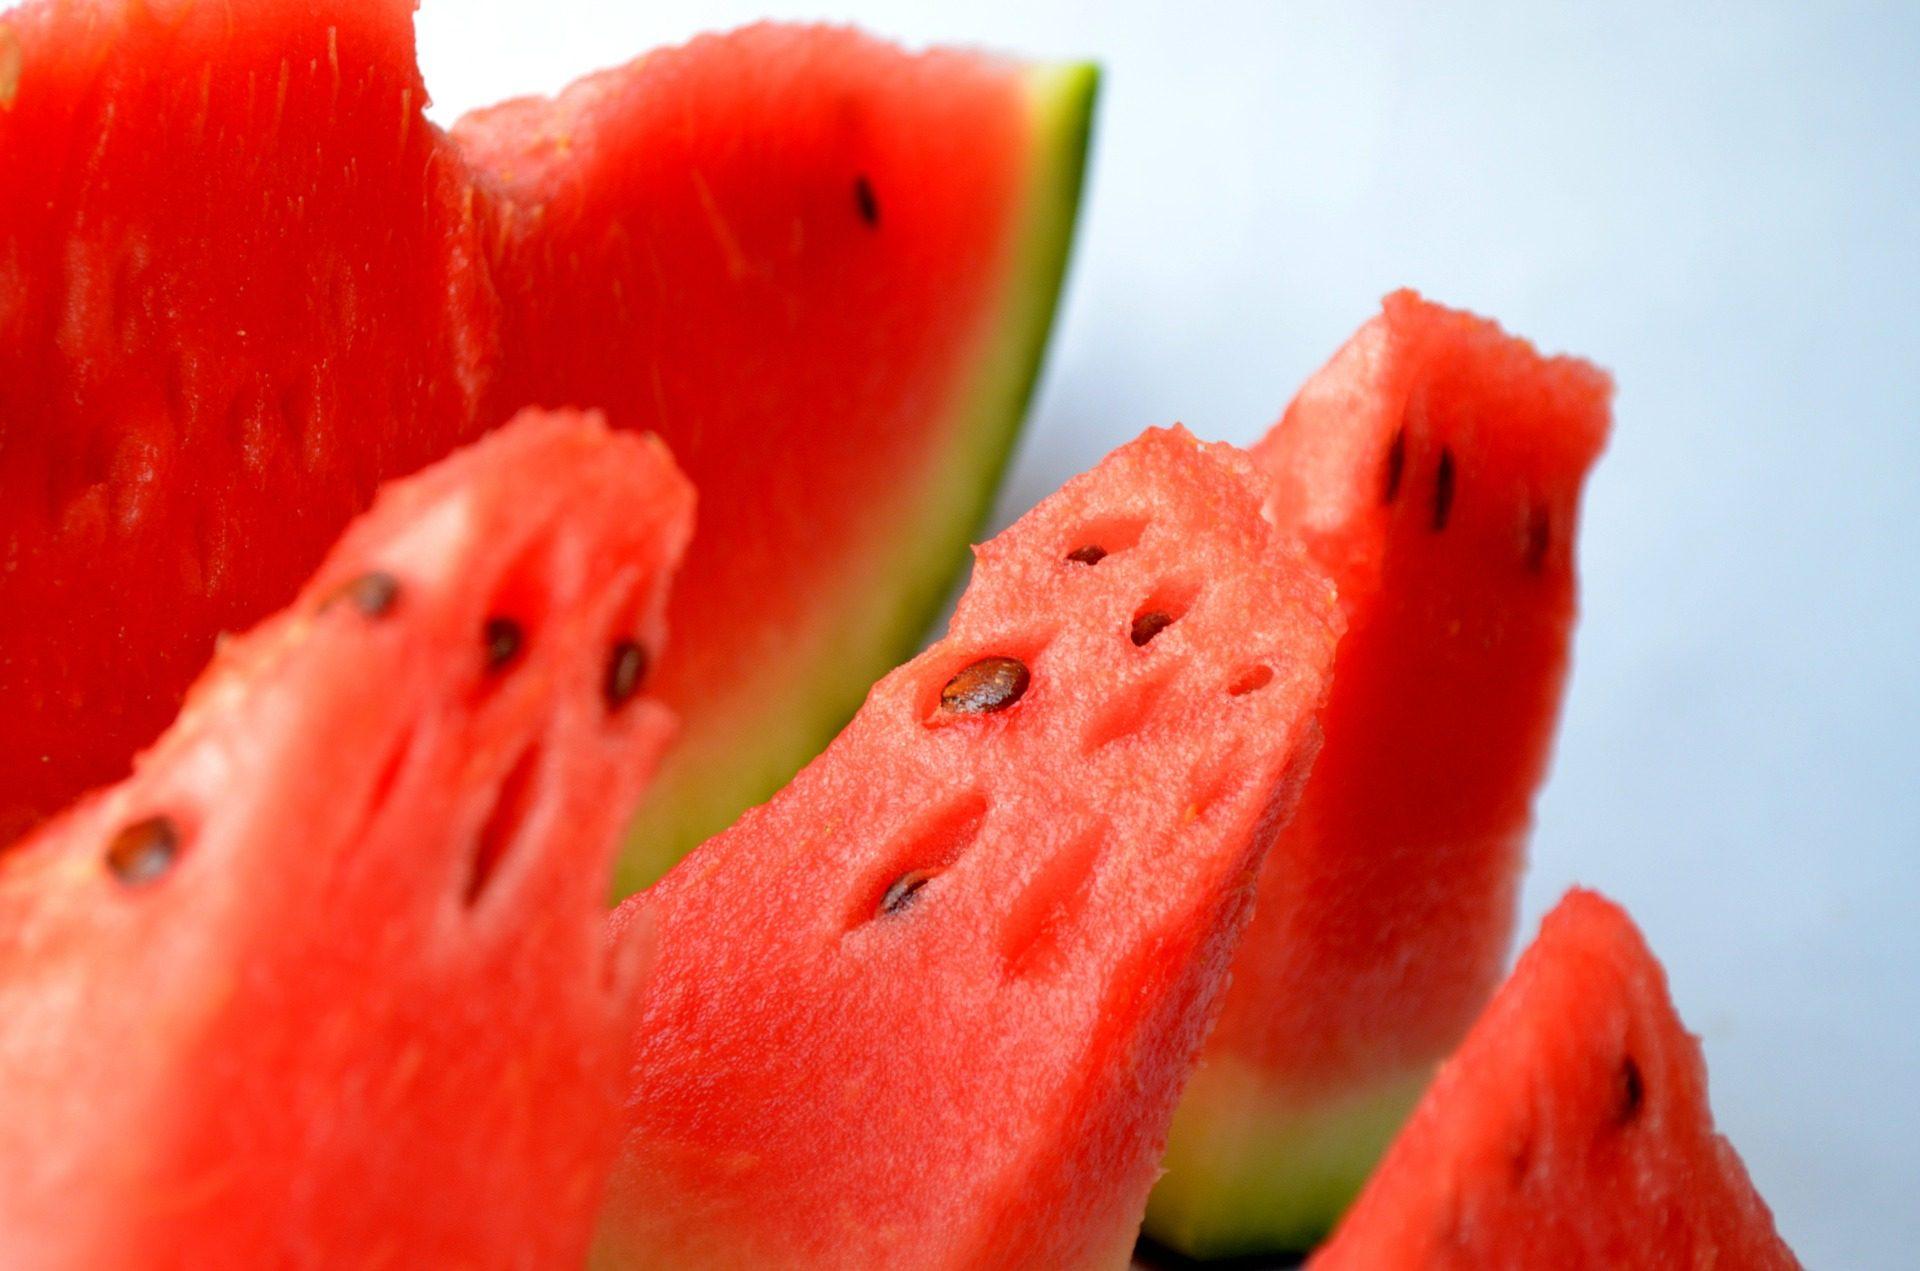 sandía, fruta, dulce, verano, fresca, roja - Fondos de Pantalla HD - professor-falken.com